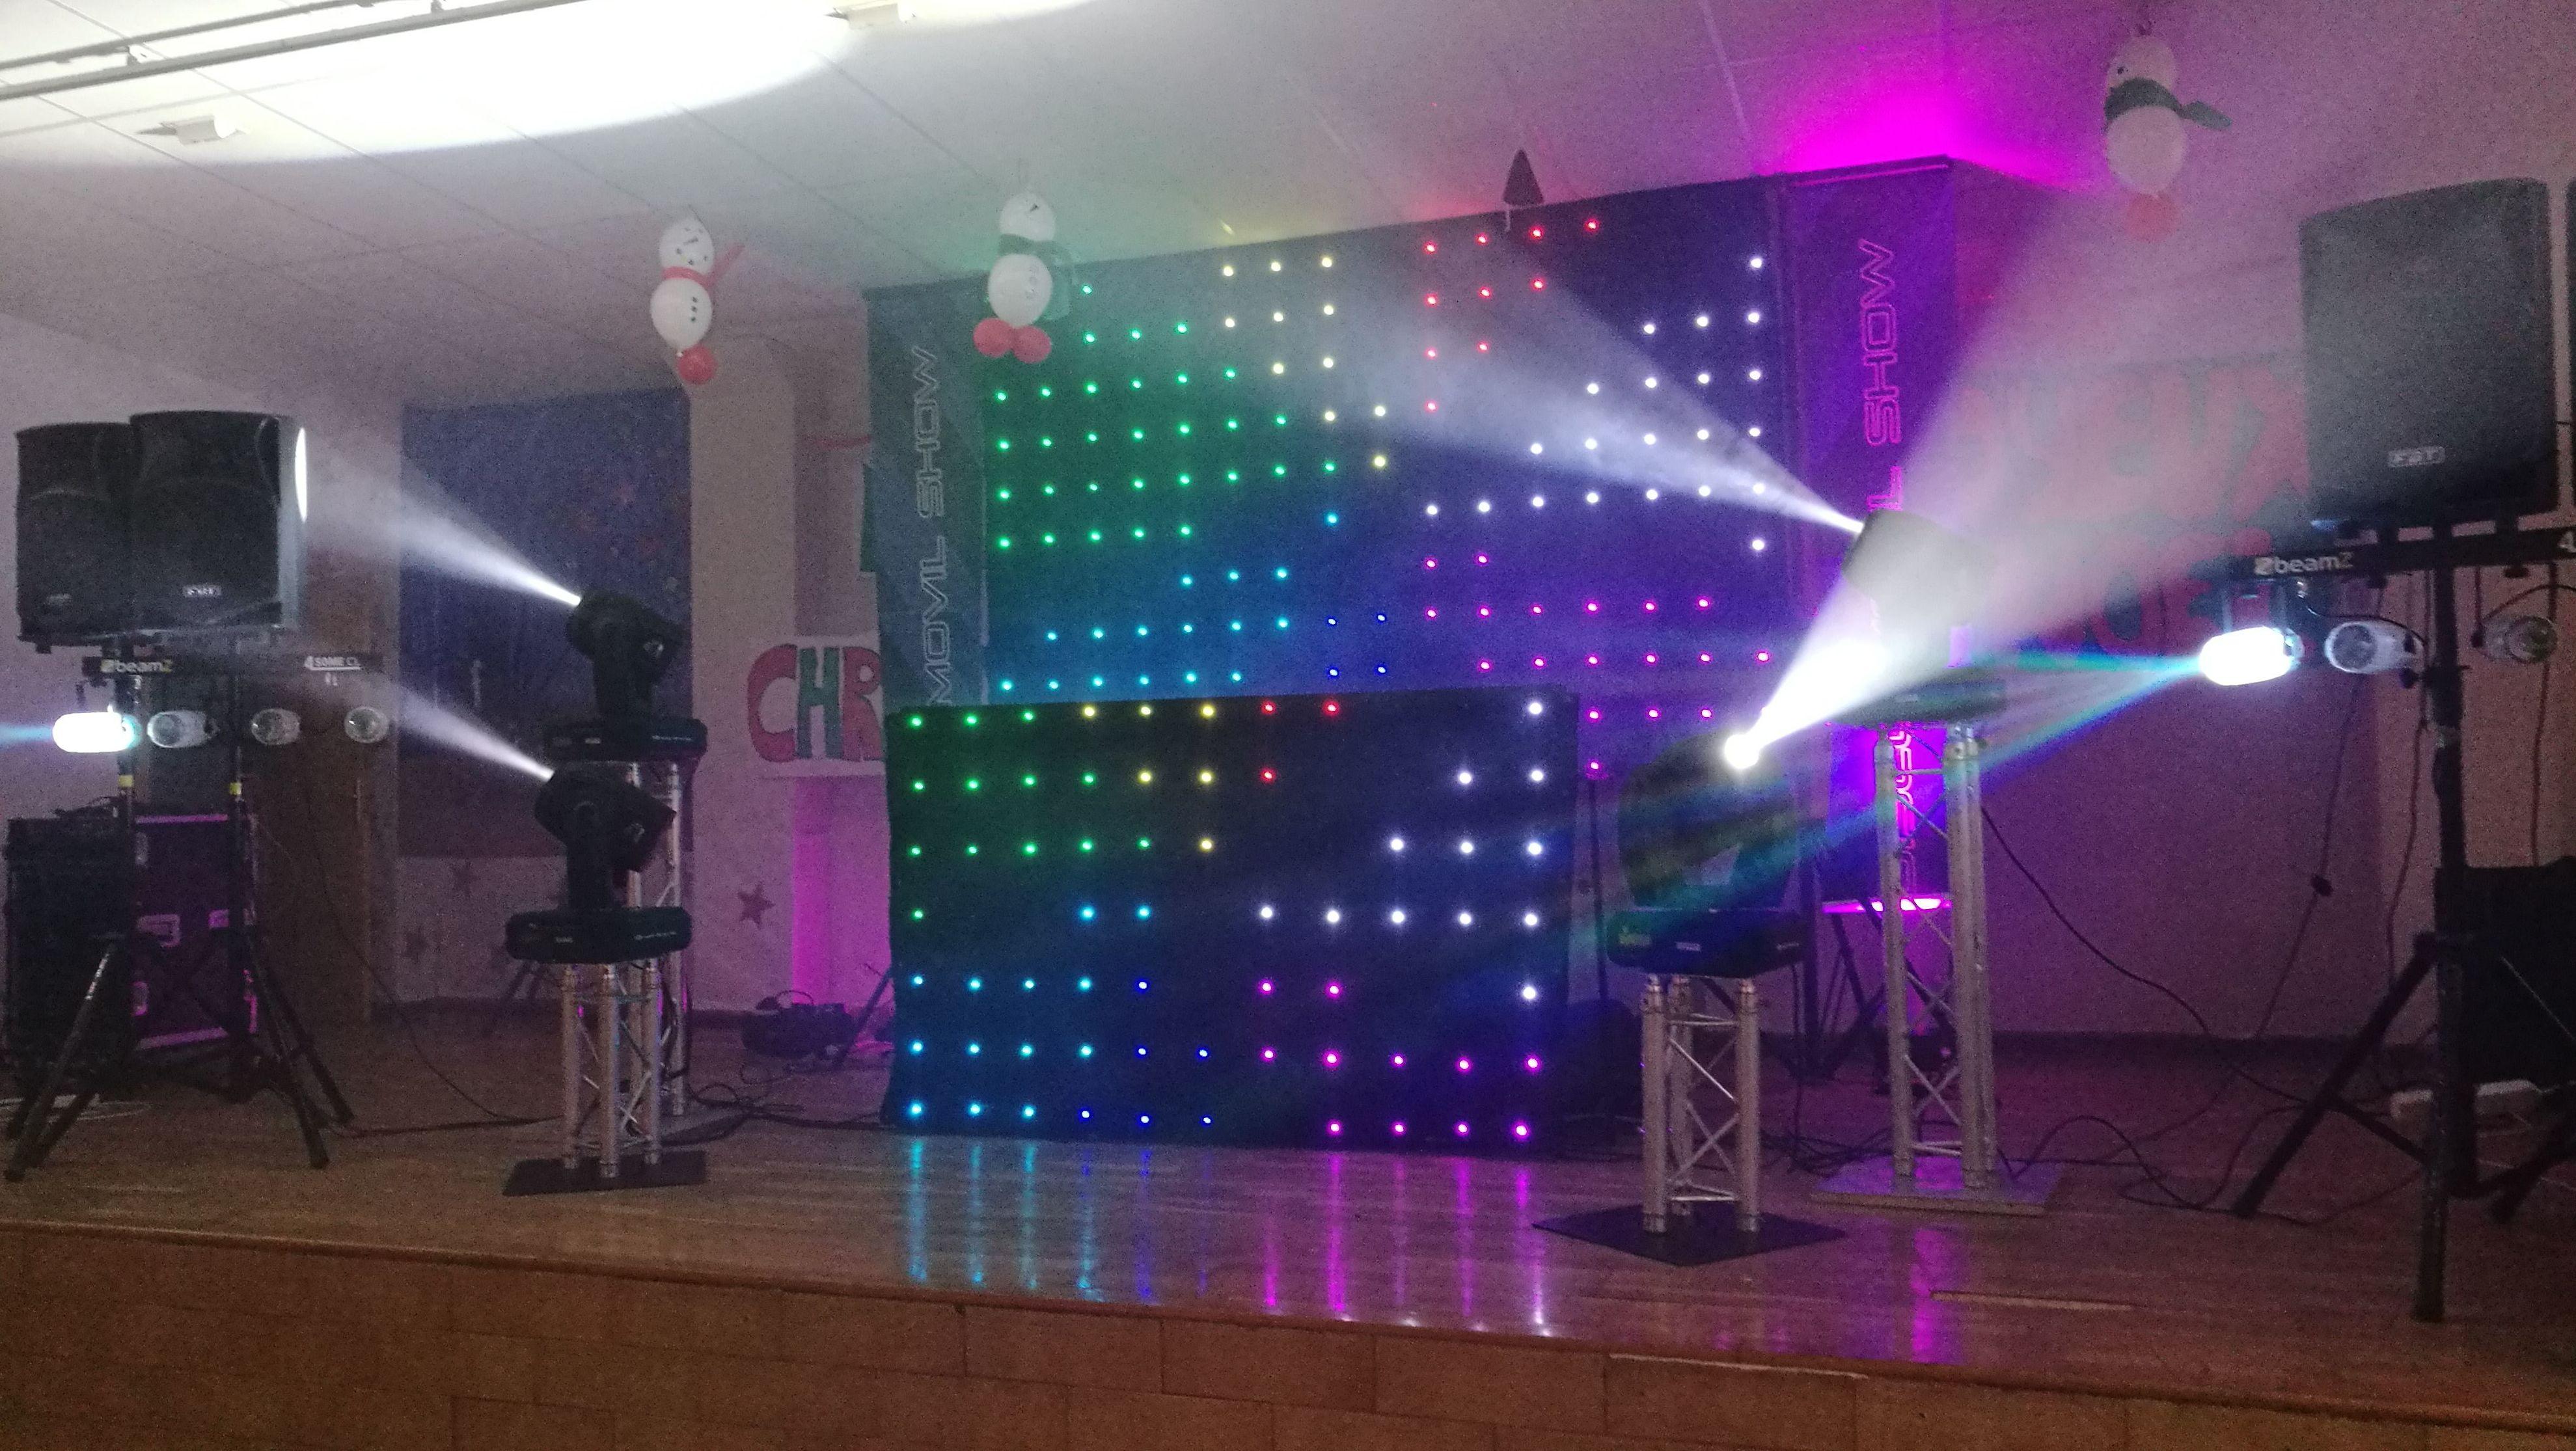 Montaje de sonido e iluminacion en interior para fiesta de Nochevieja